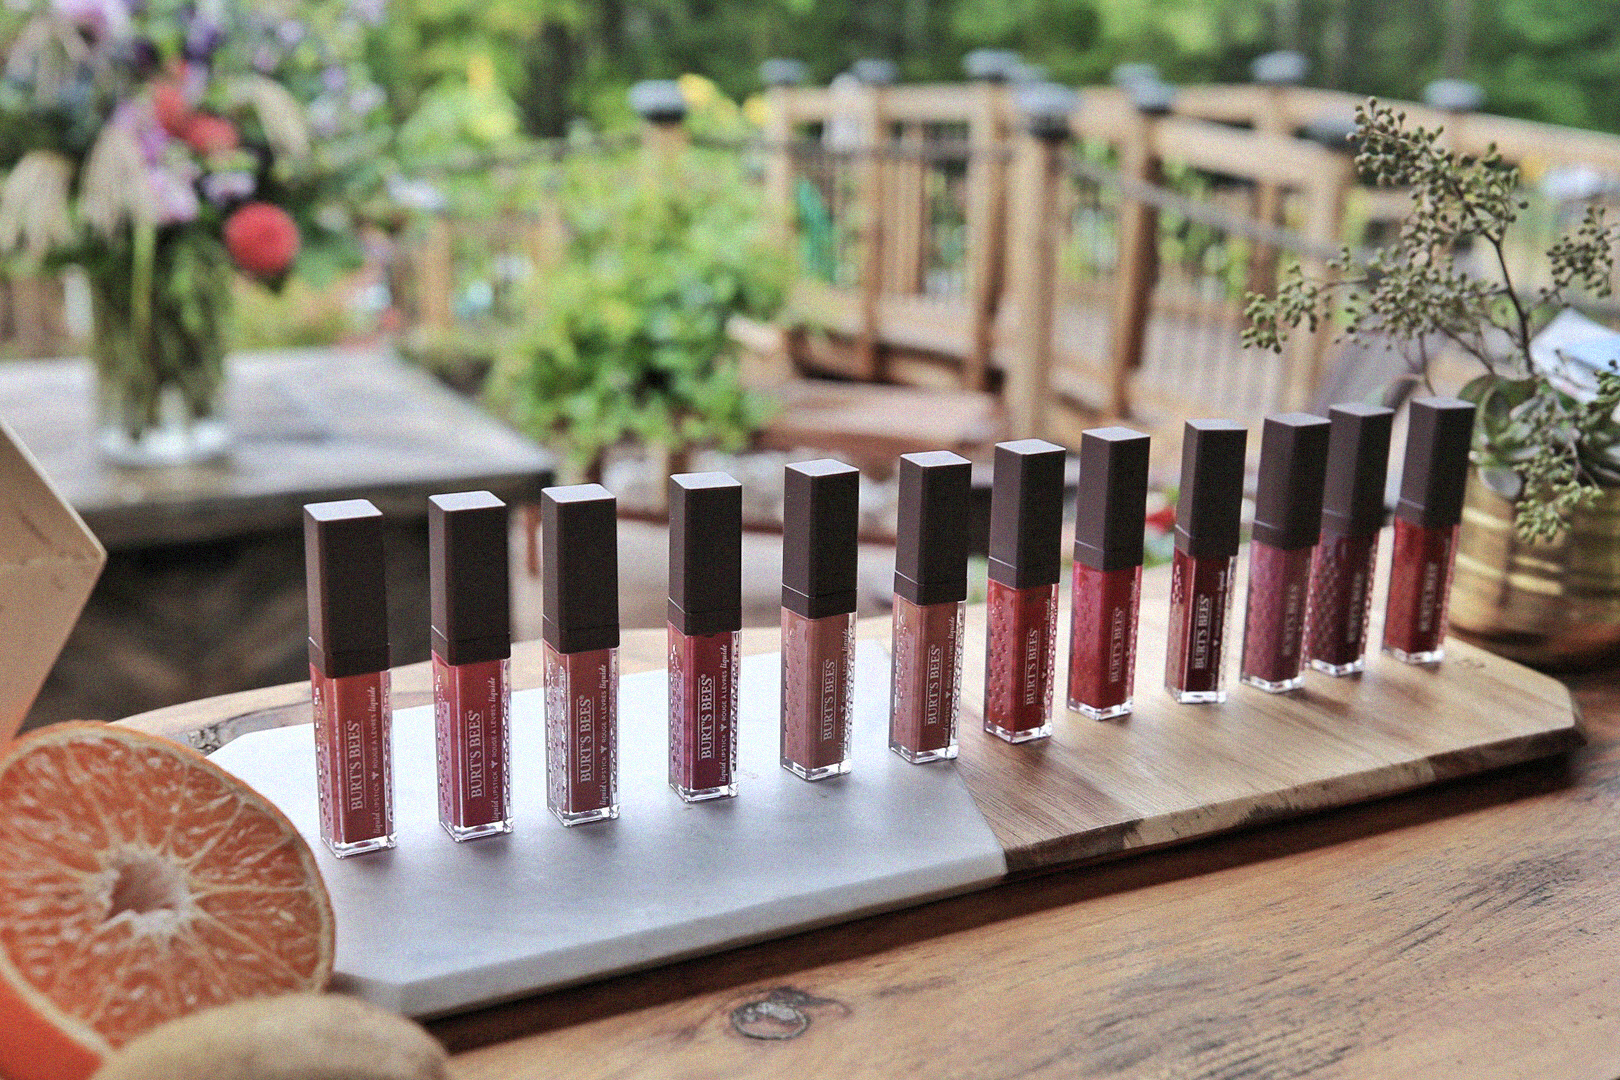 Burt's Bees 2019 launches, liquid lipsticks, natural makeup  - photos by Nathalie Martin, woahstyle.com_9857.JPG